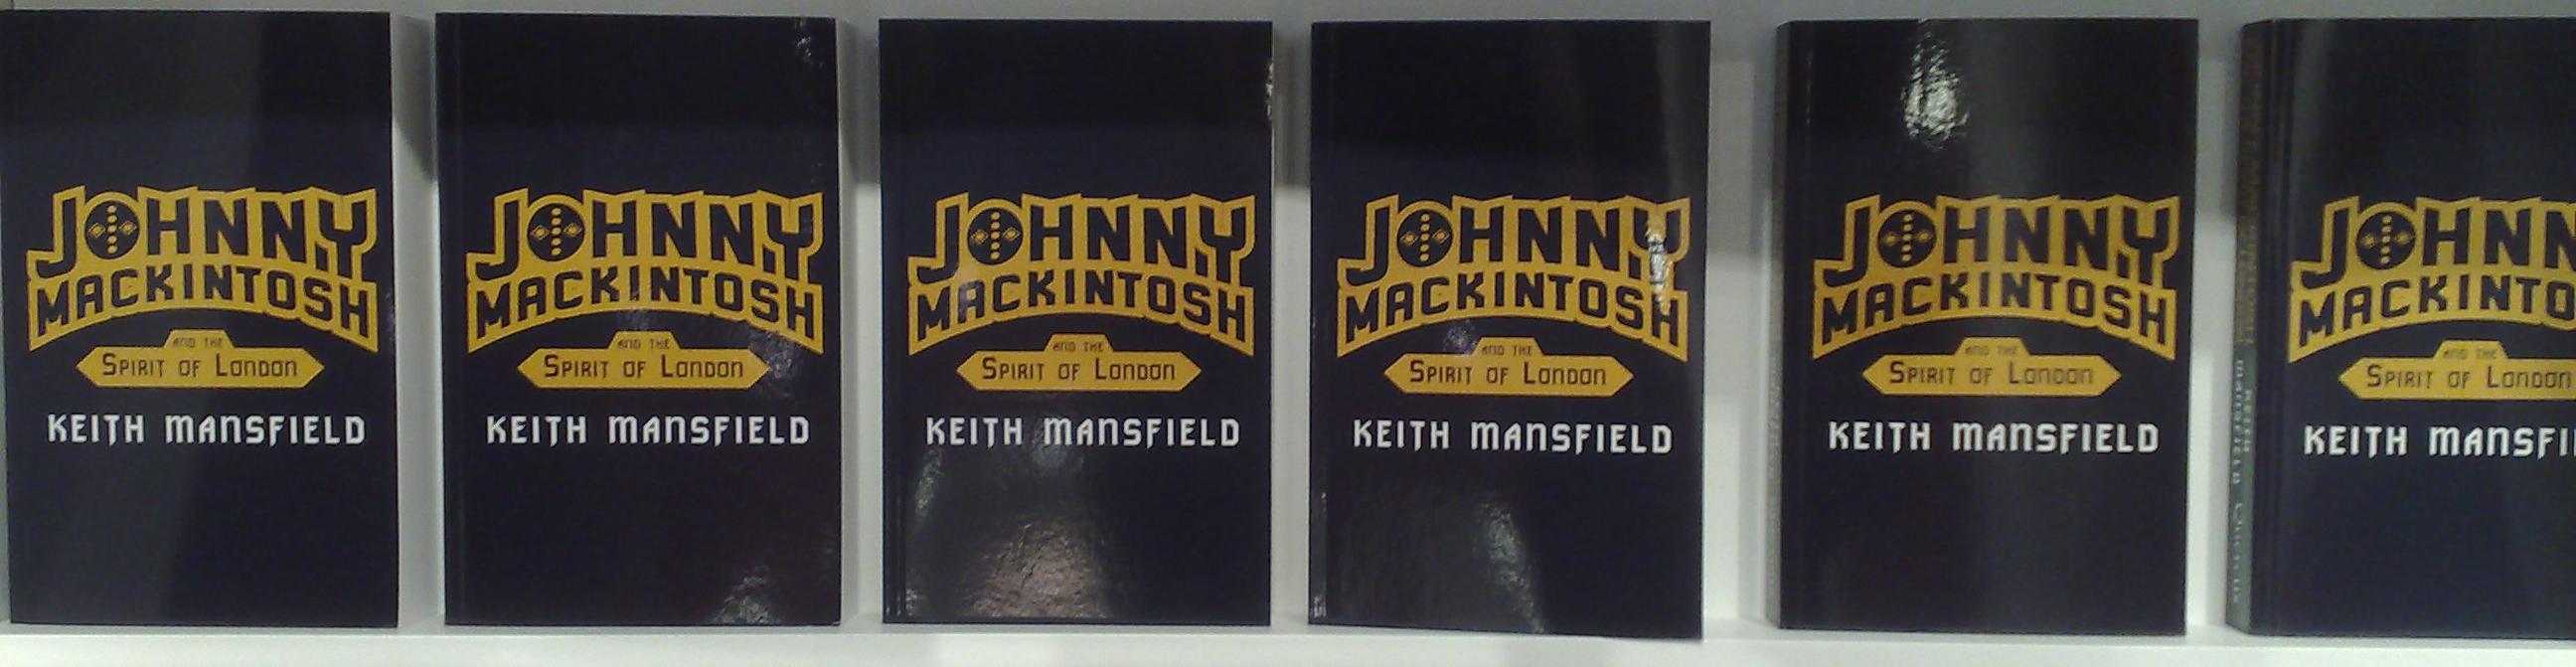 Line of Johnny mackintosh